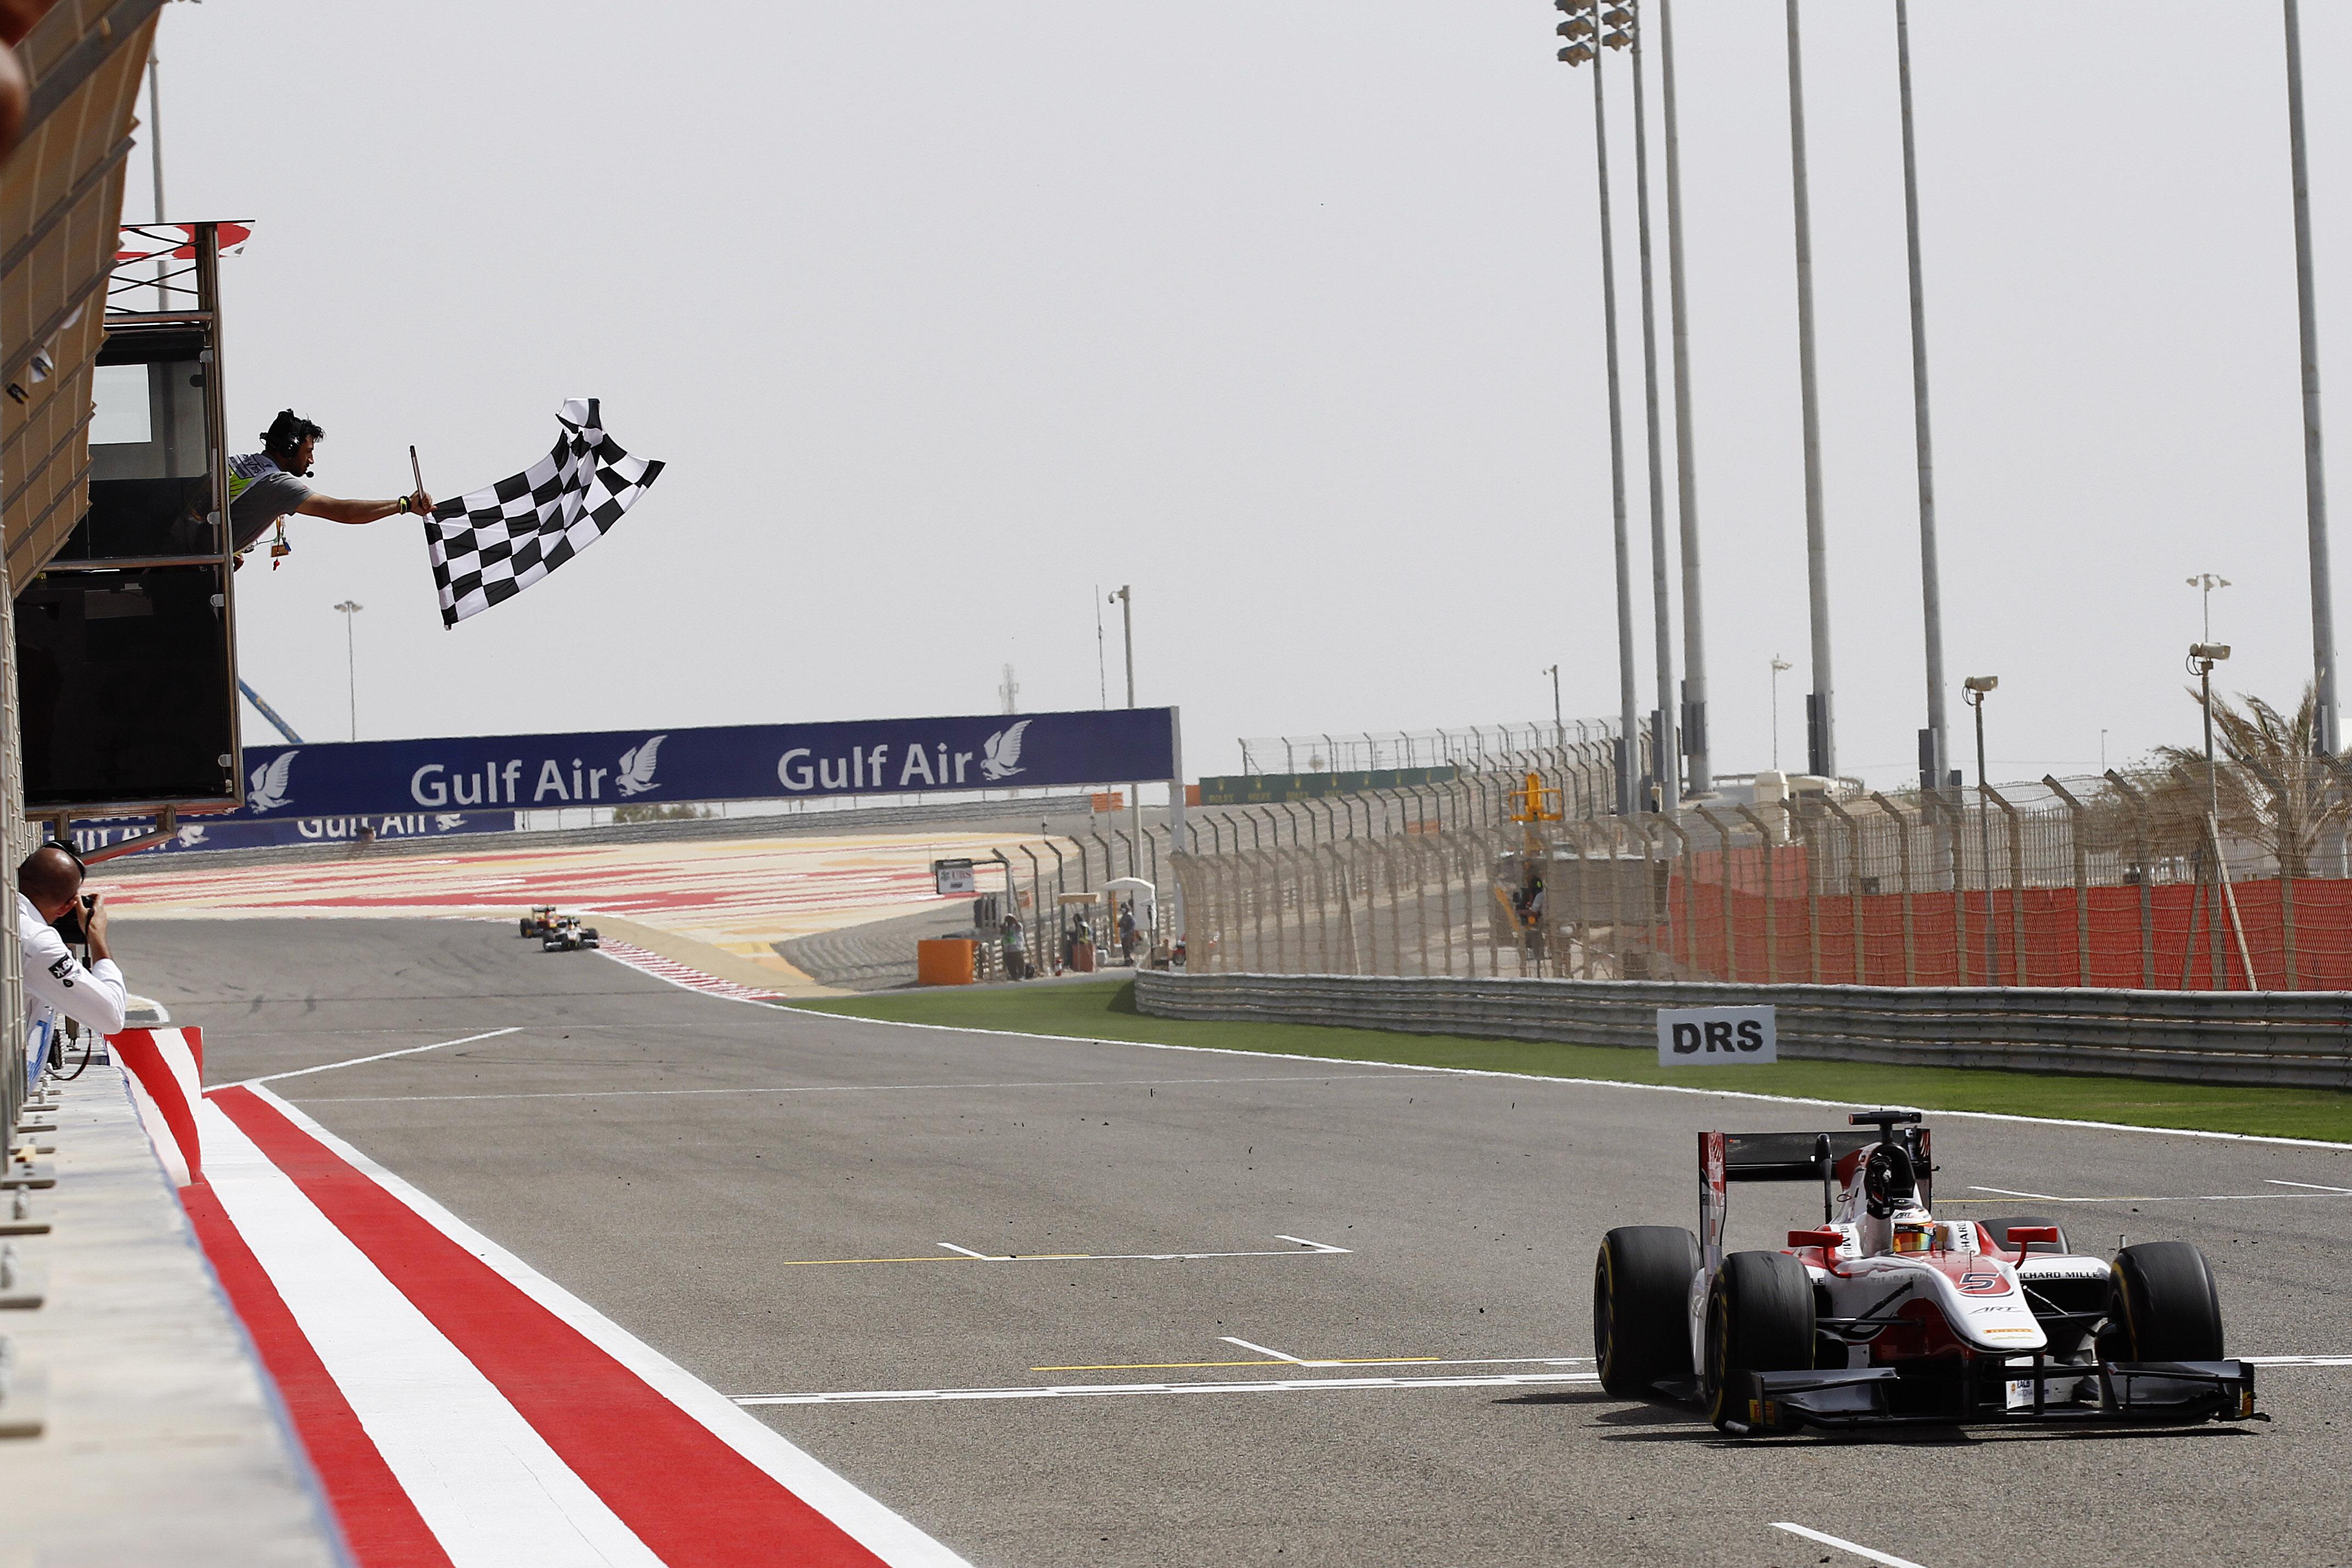 GP2: Vandoorne fights back for crushing win